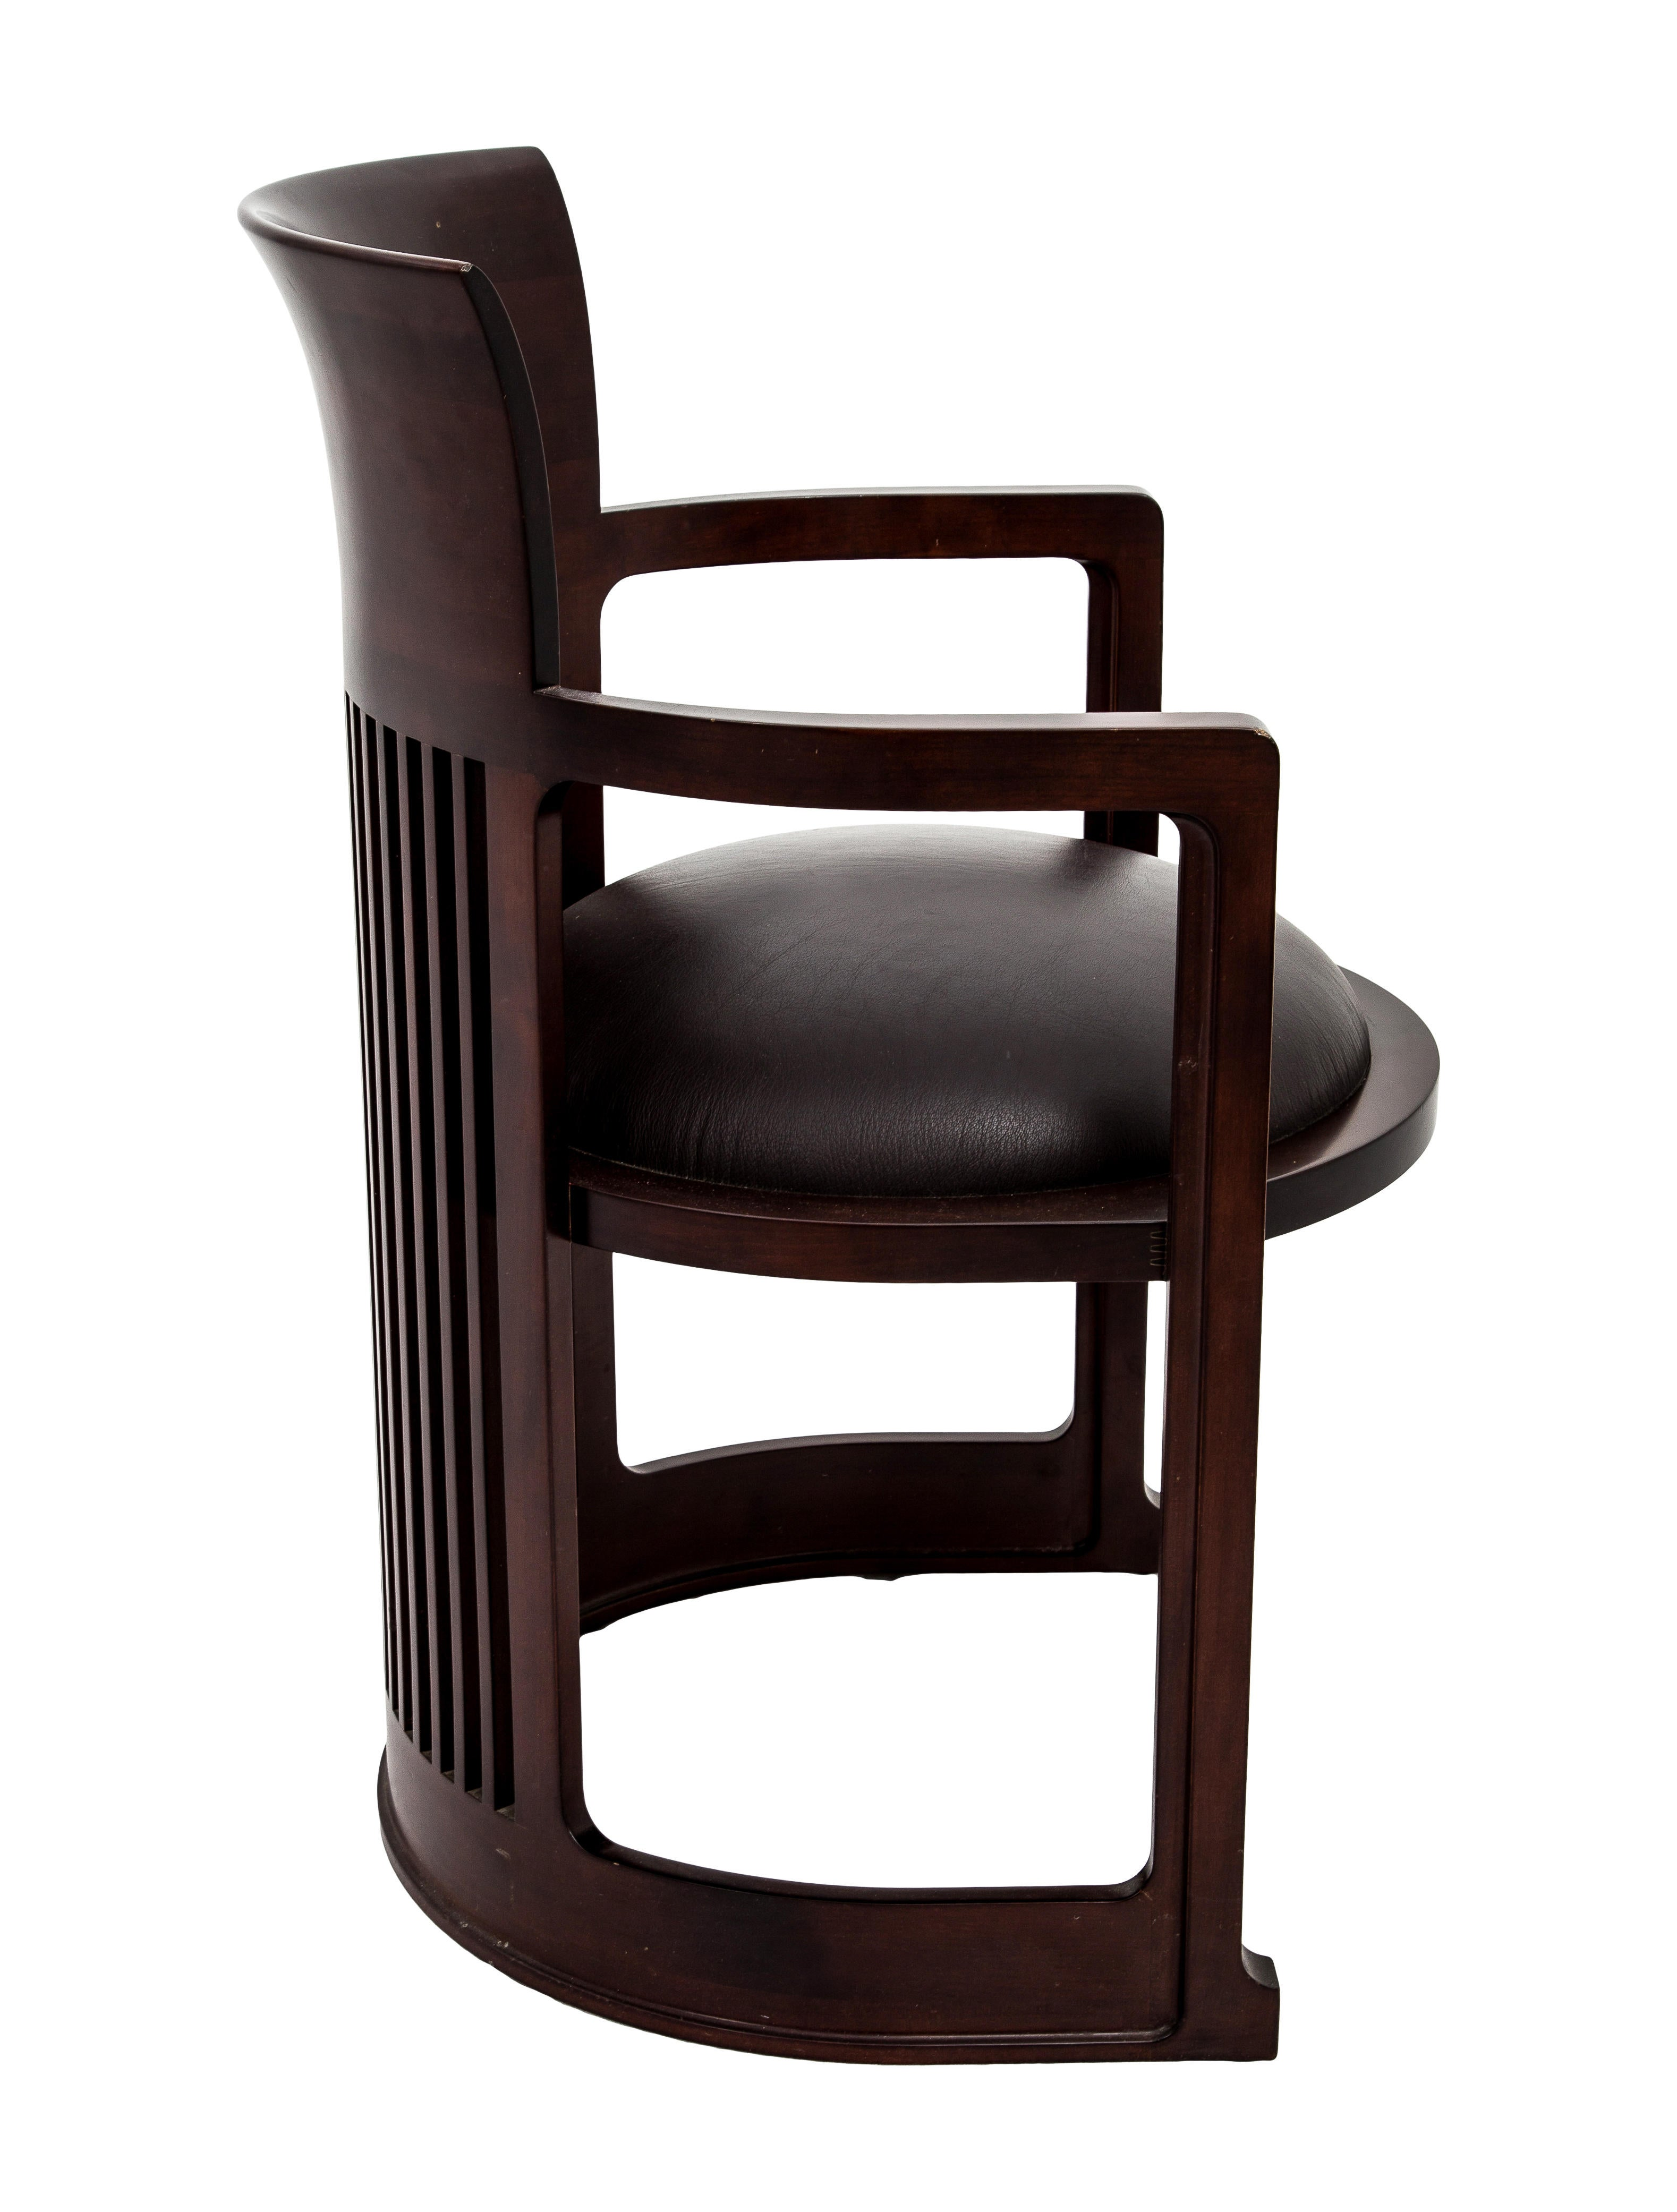 Cassina Frank Lloyd Wright Barrel Chair Furniture CSI